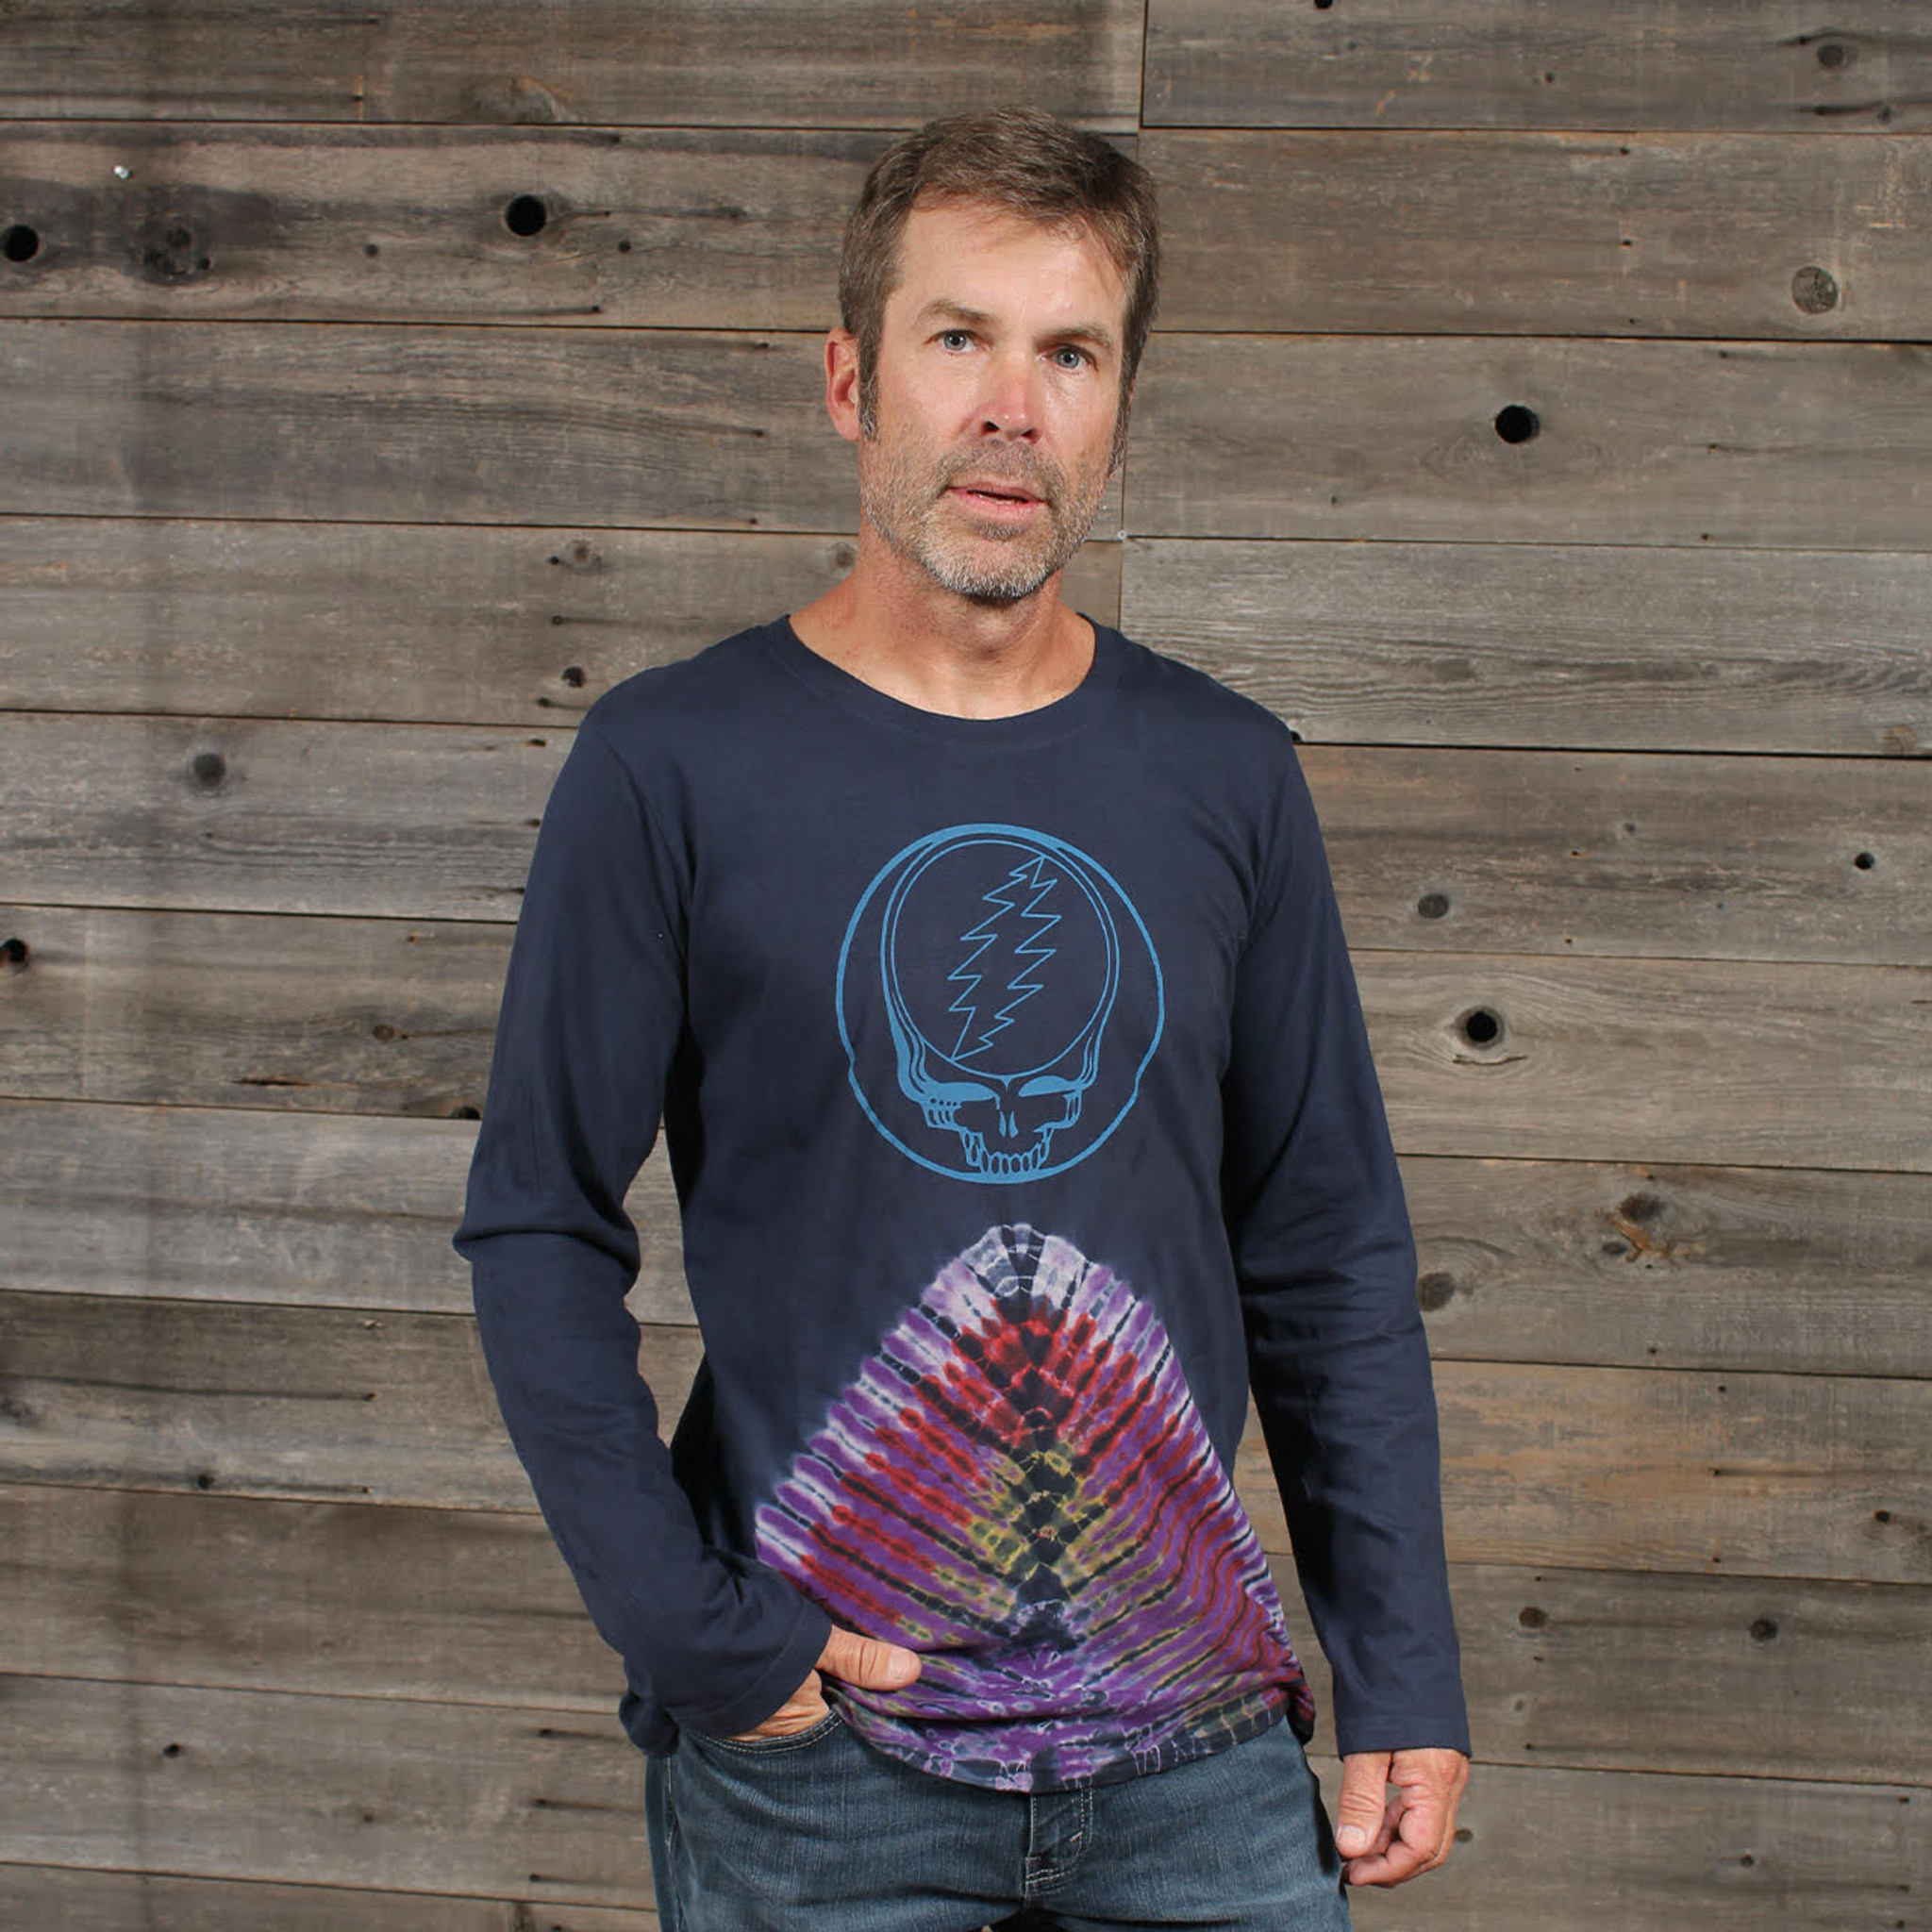 MICKY SHIRT Cotton Pyramid Tie Dye Long Sleeve T-Shirt W/ SYF Print